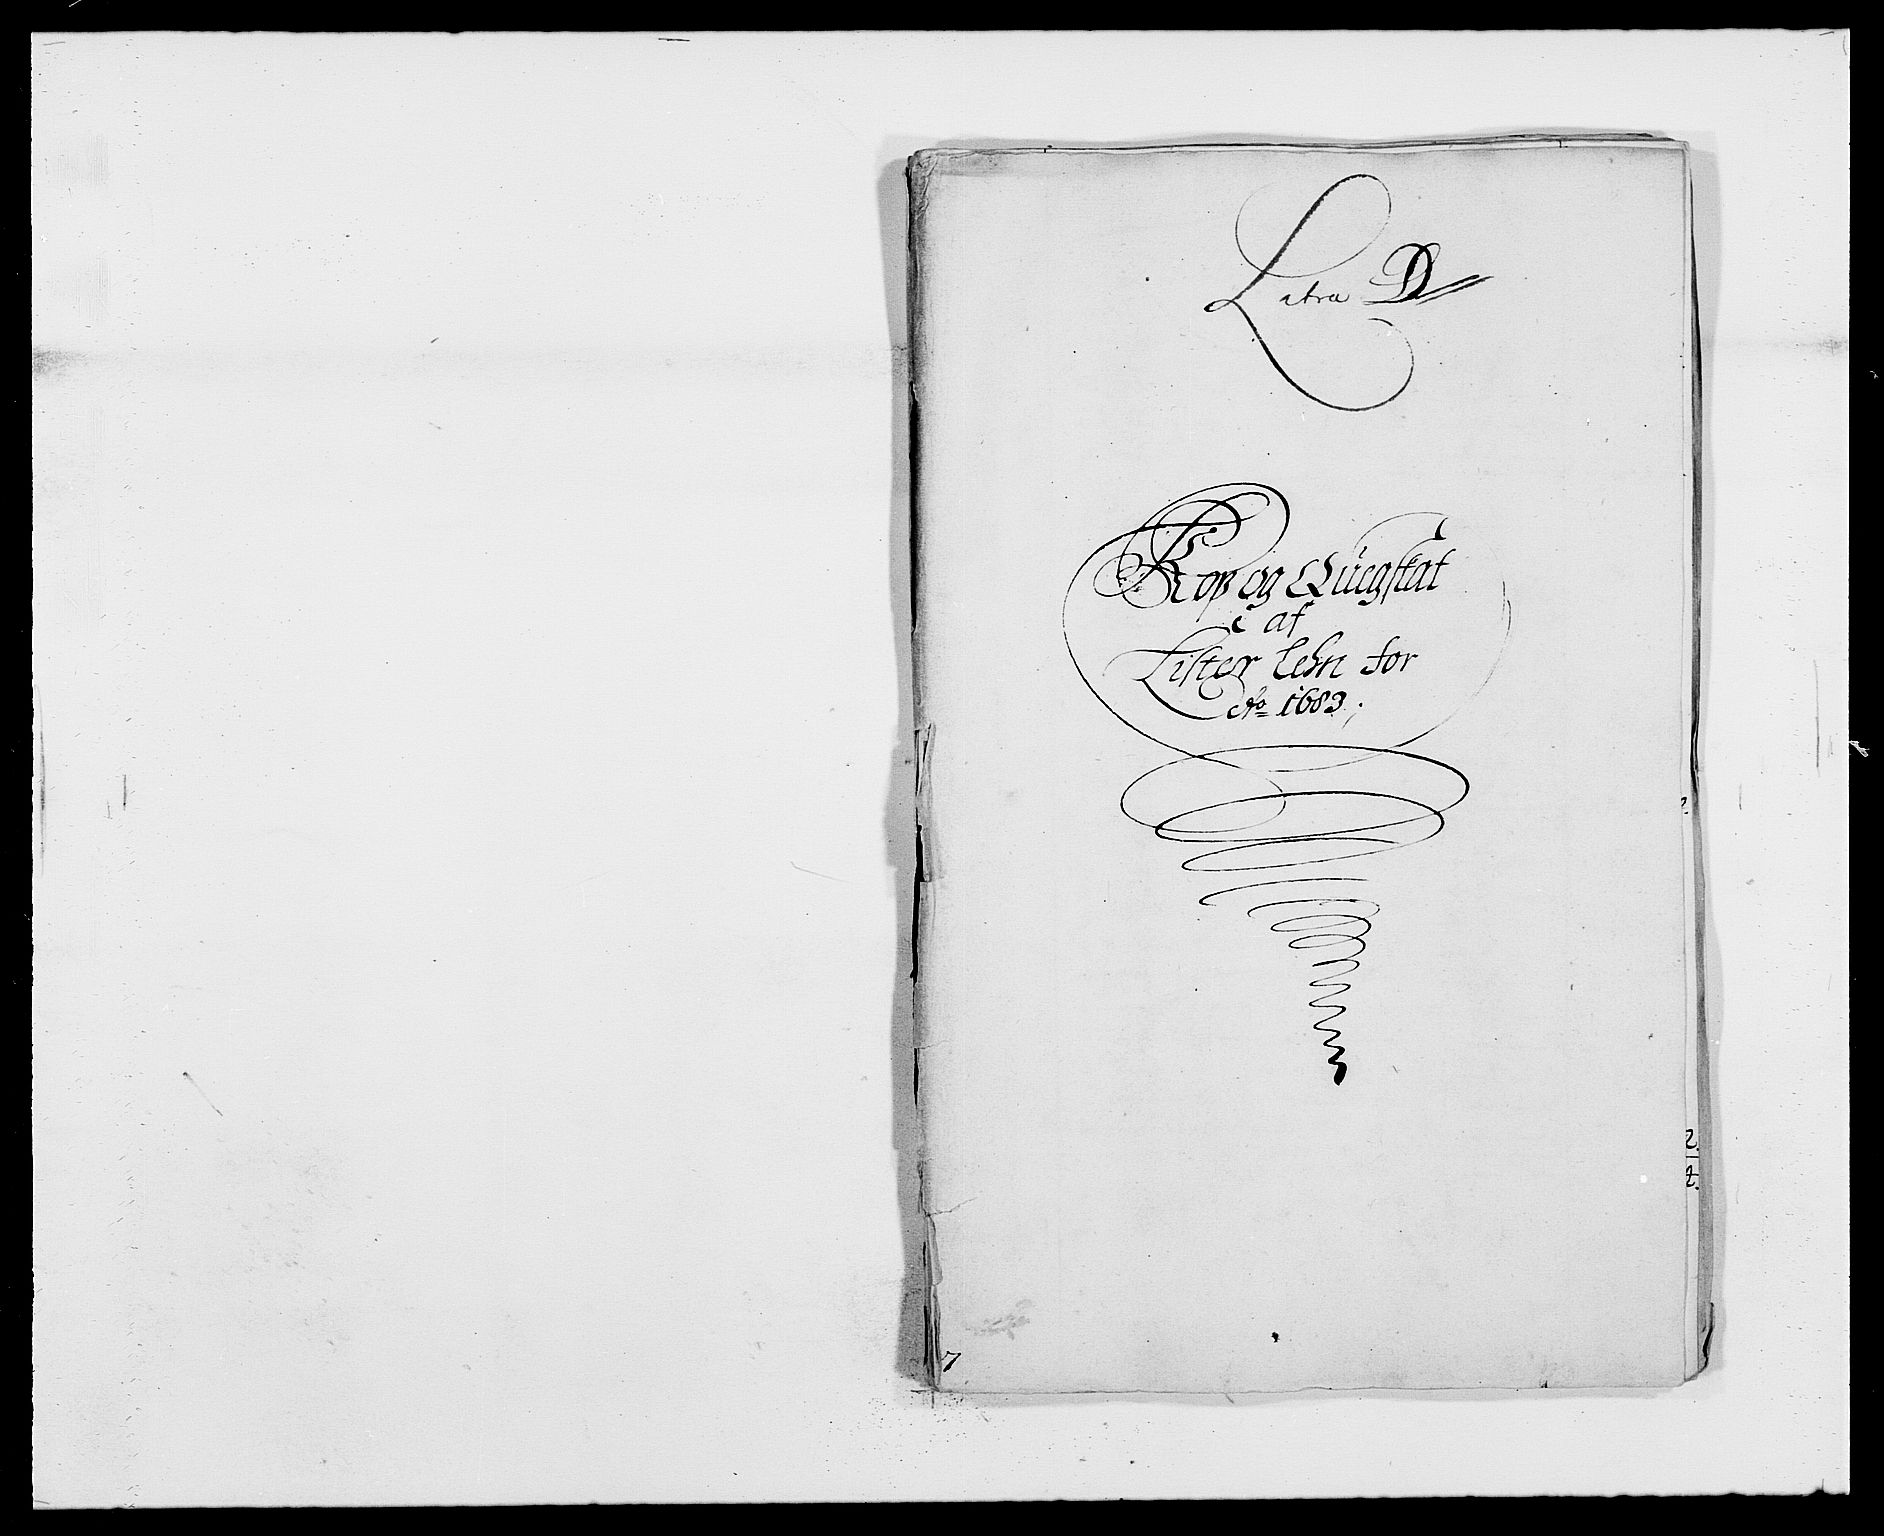 RA, Rentekammeret inntil 1814, Reviderte regnskaper, Fogderegnskap, R41/L2532: Fogderegnskap Lista, 1683, s. 100